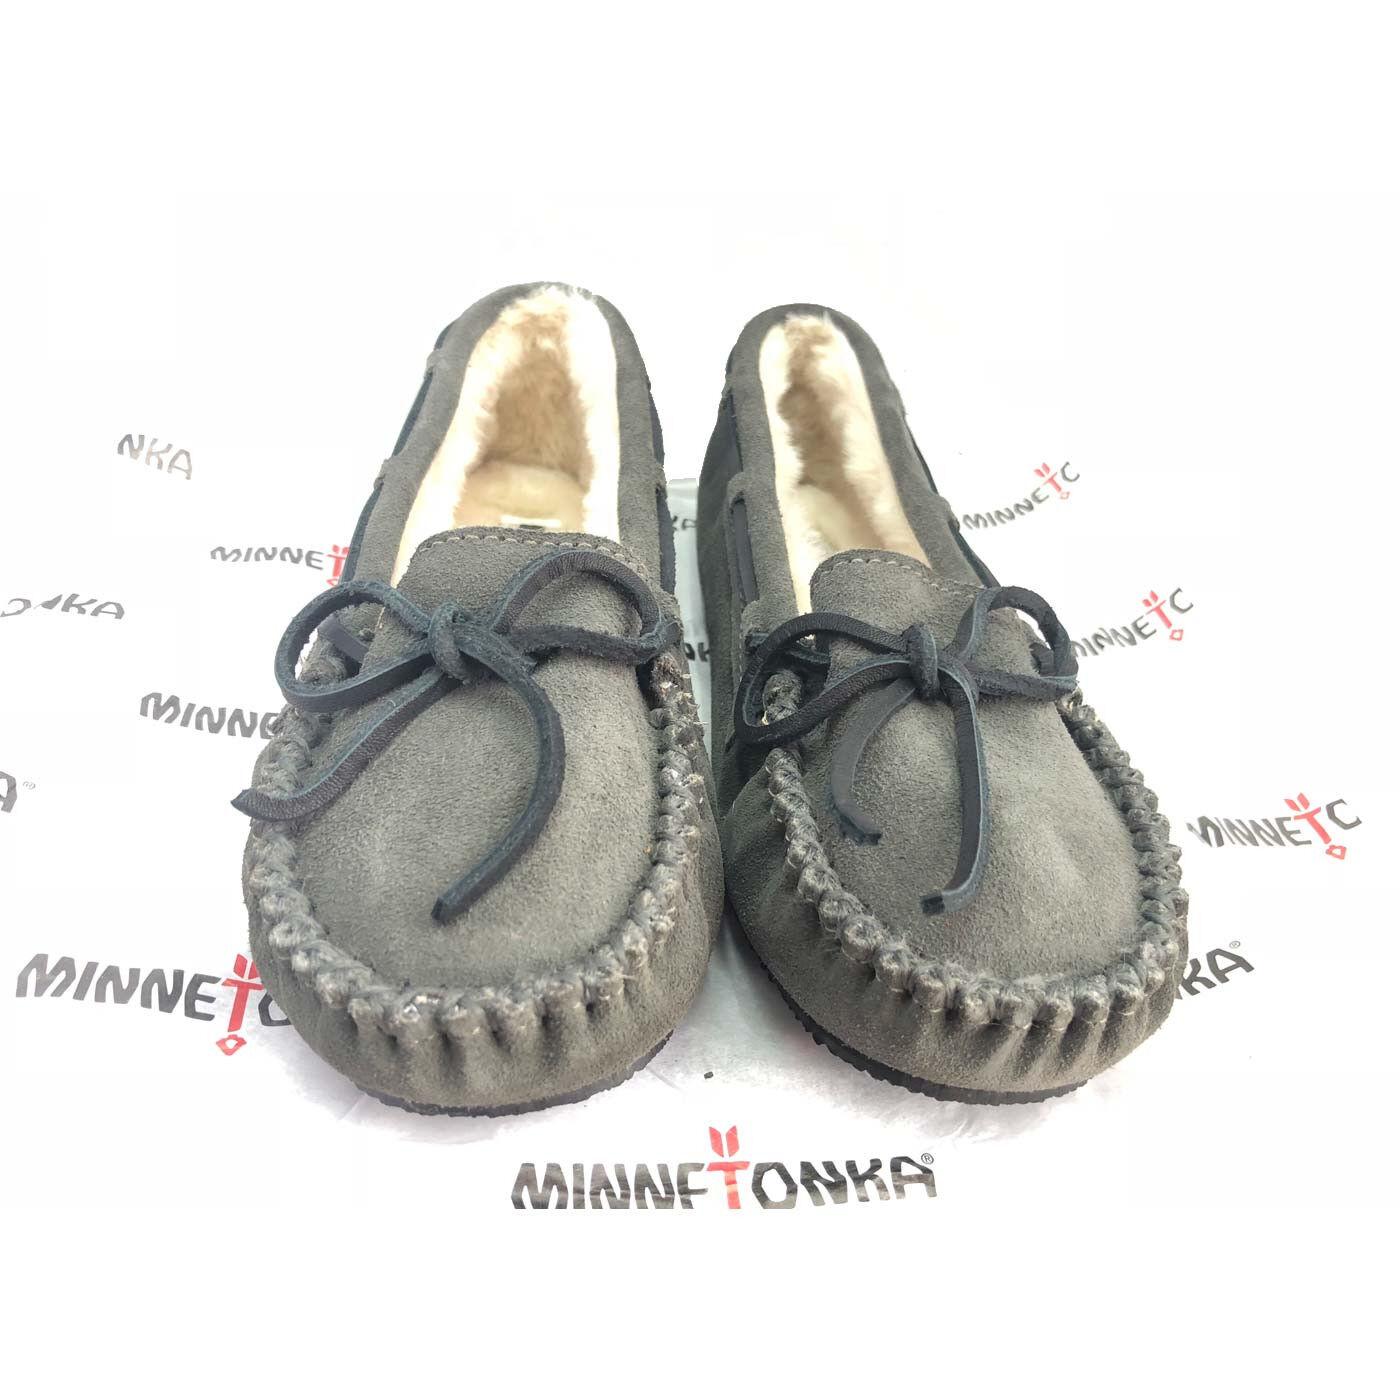 Minnetonka Women's Cally Slipper Moccasin - Grey Grey (9US)